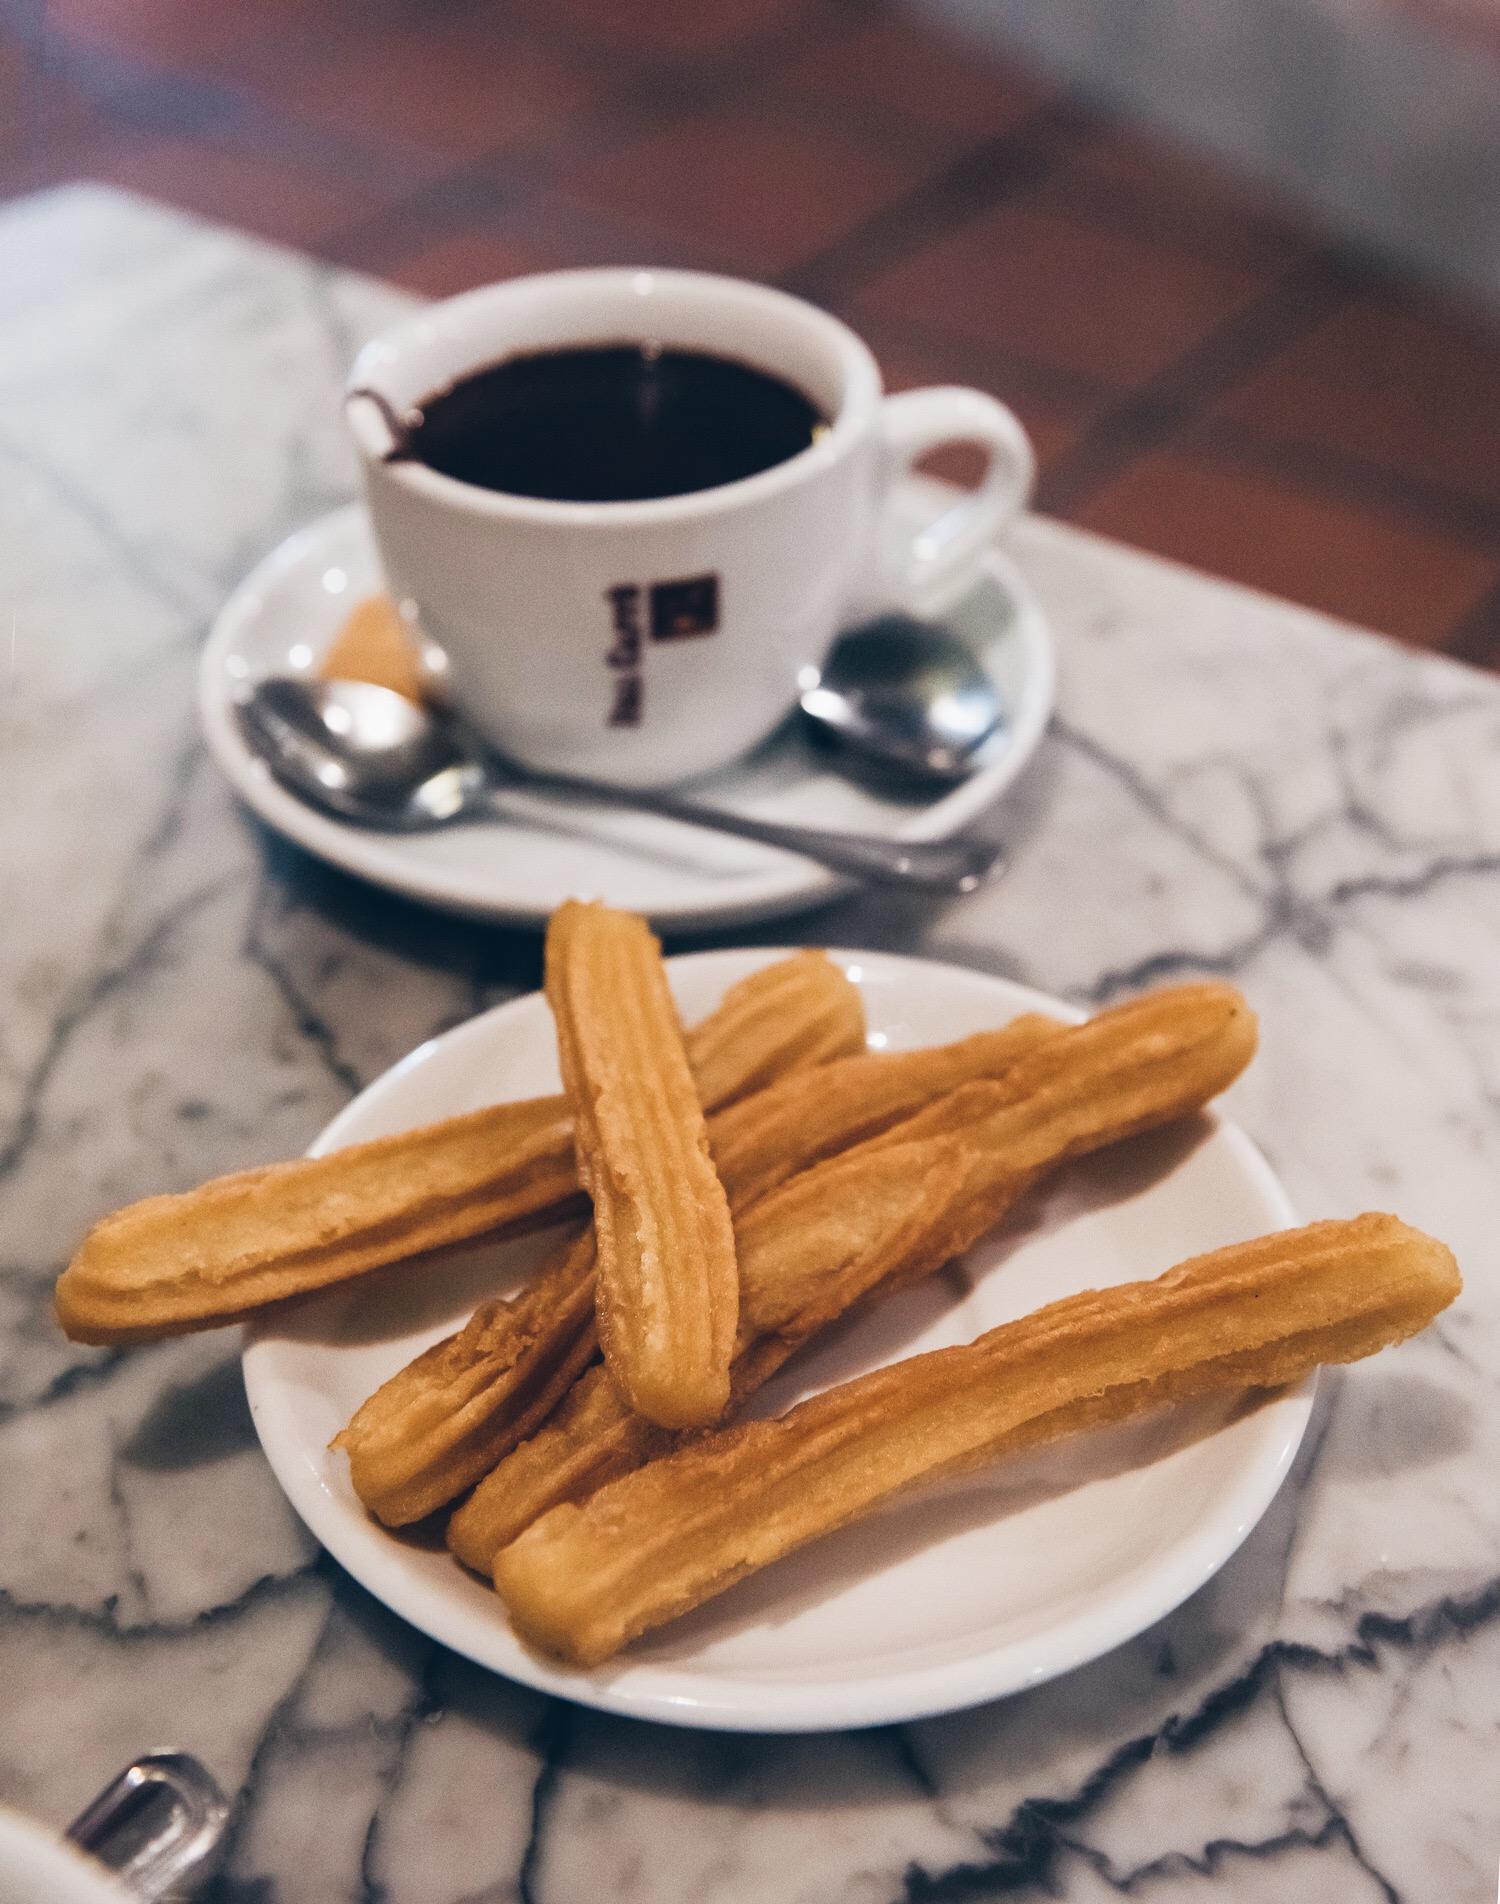 Churros and hot chocolate at La Nena, Barcelona